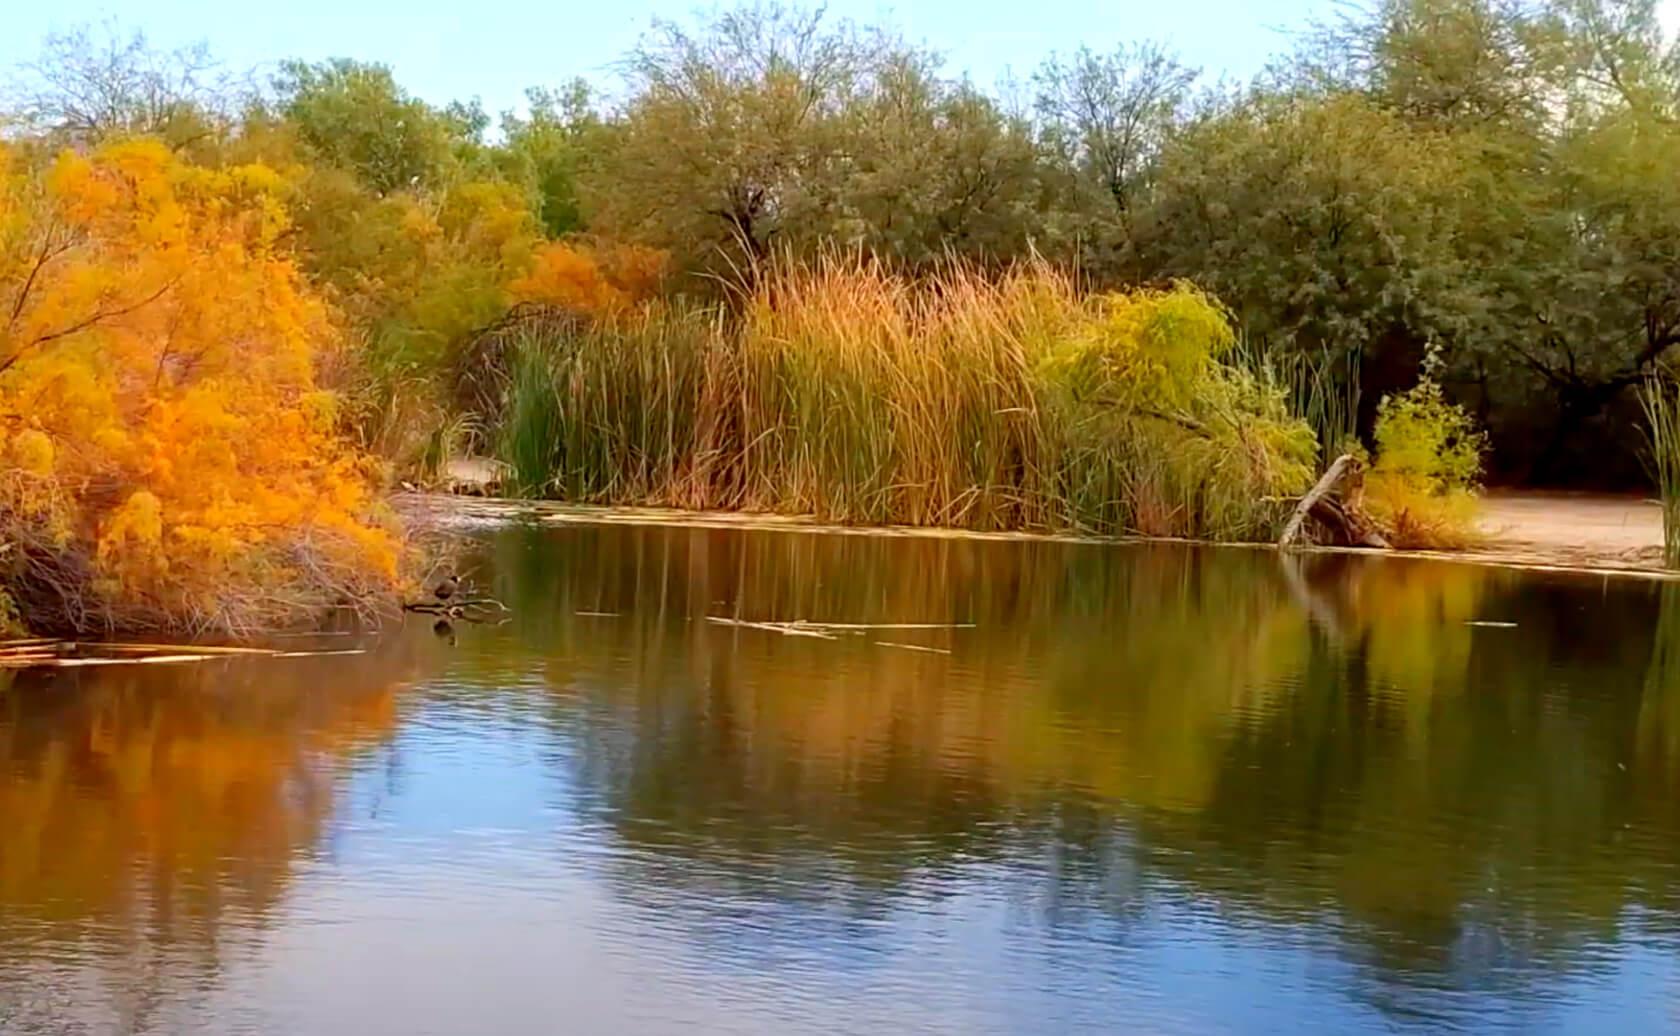 Fortuna-Lake-Fishing-Guide-Report-Yuma-AZ-04